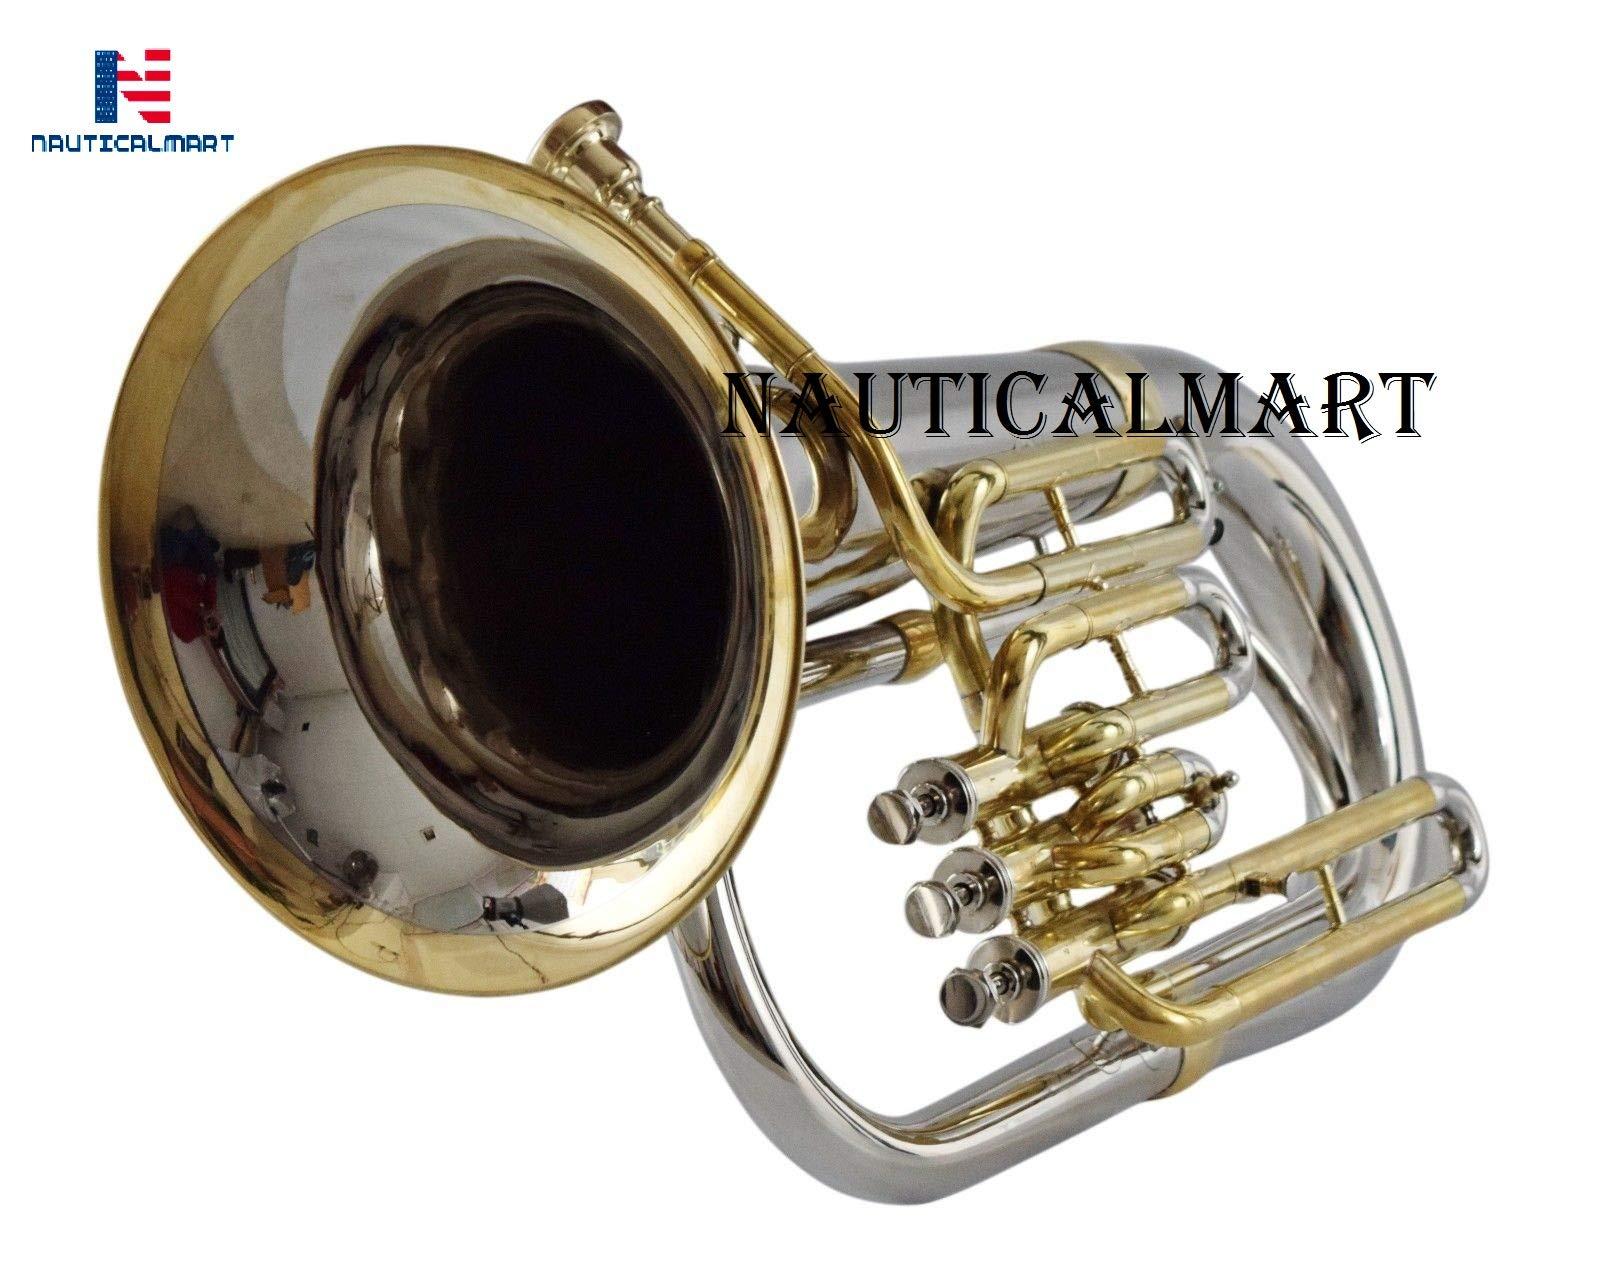 NauticalMart Nickel Bb Euphonium Nickel + Brass 3 Valve